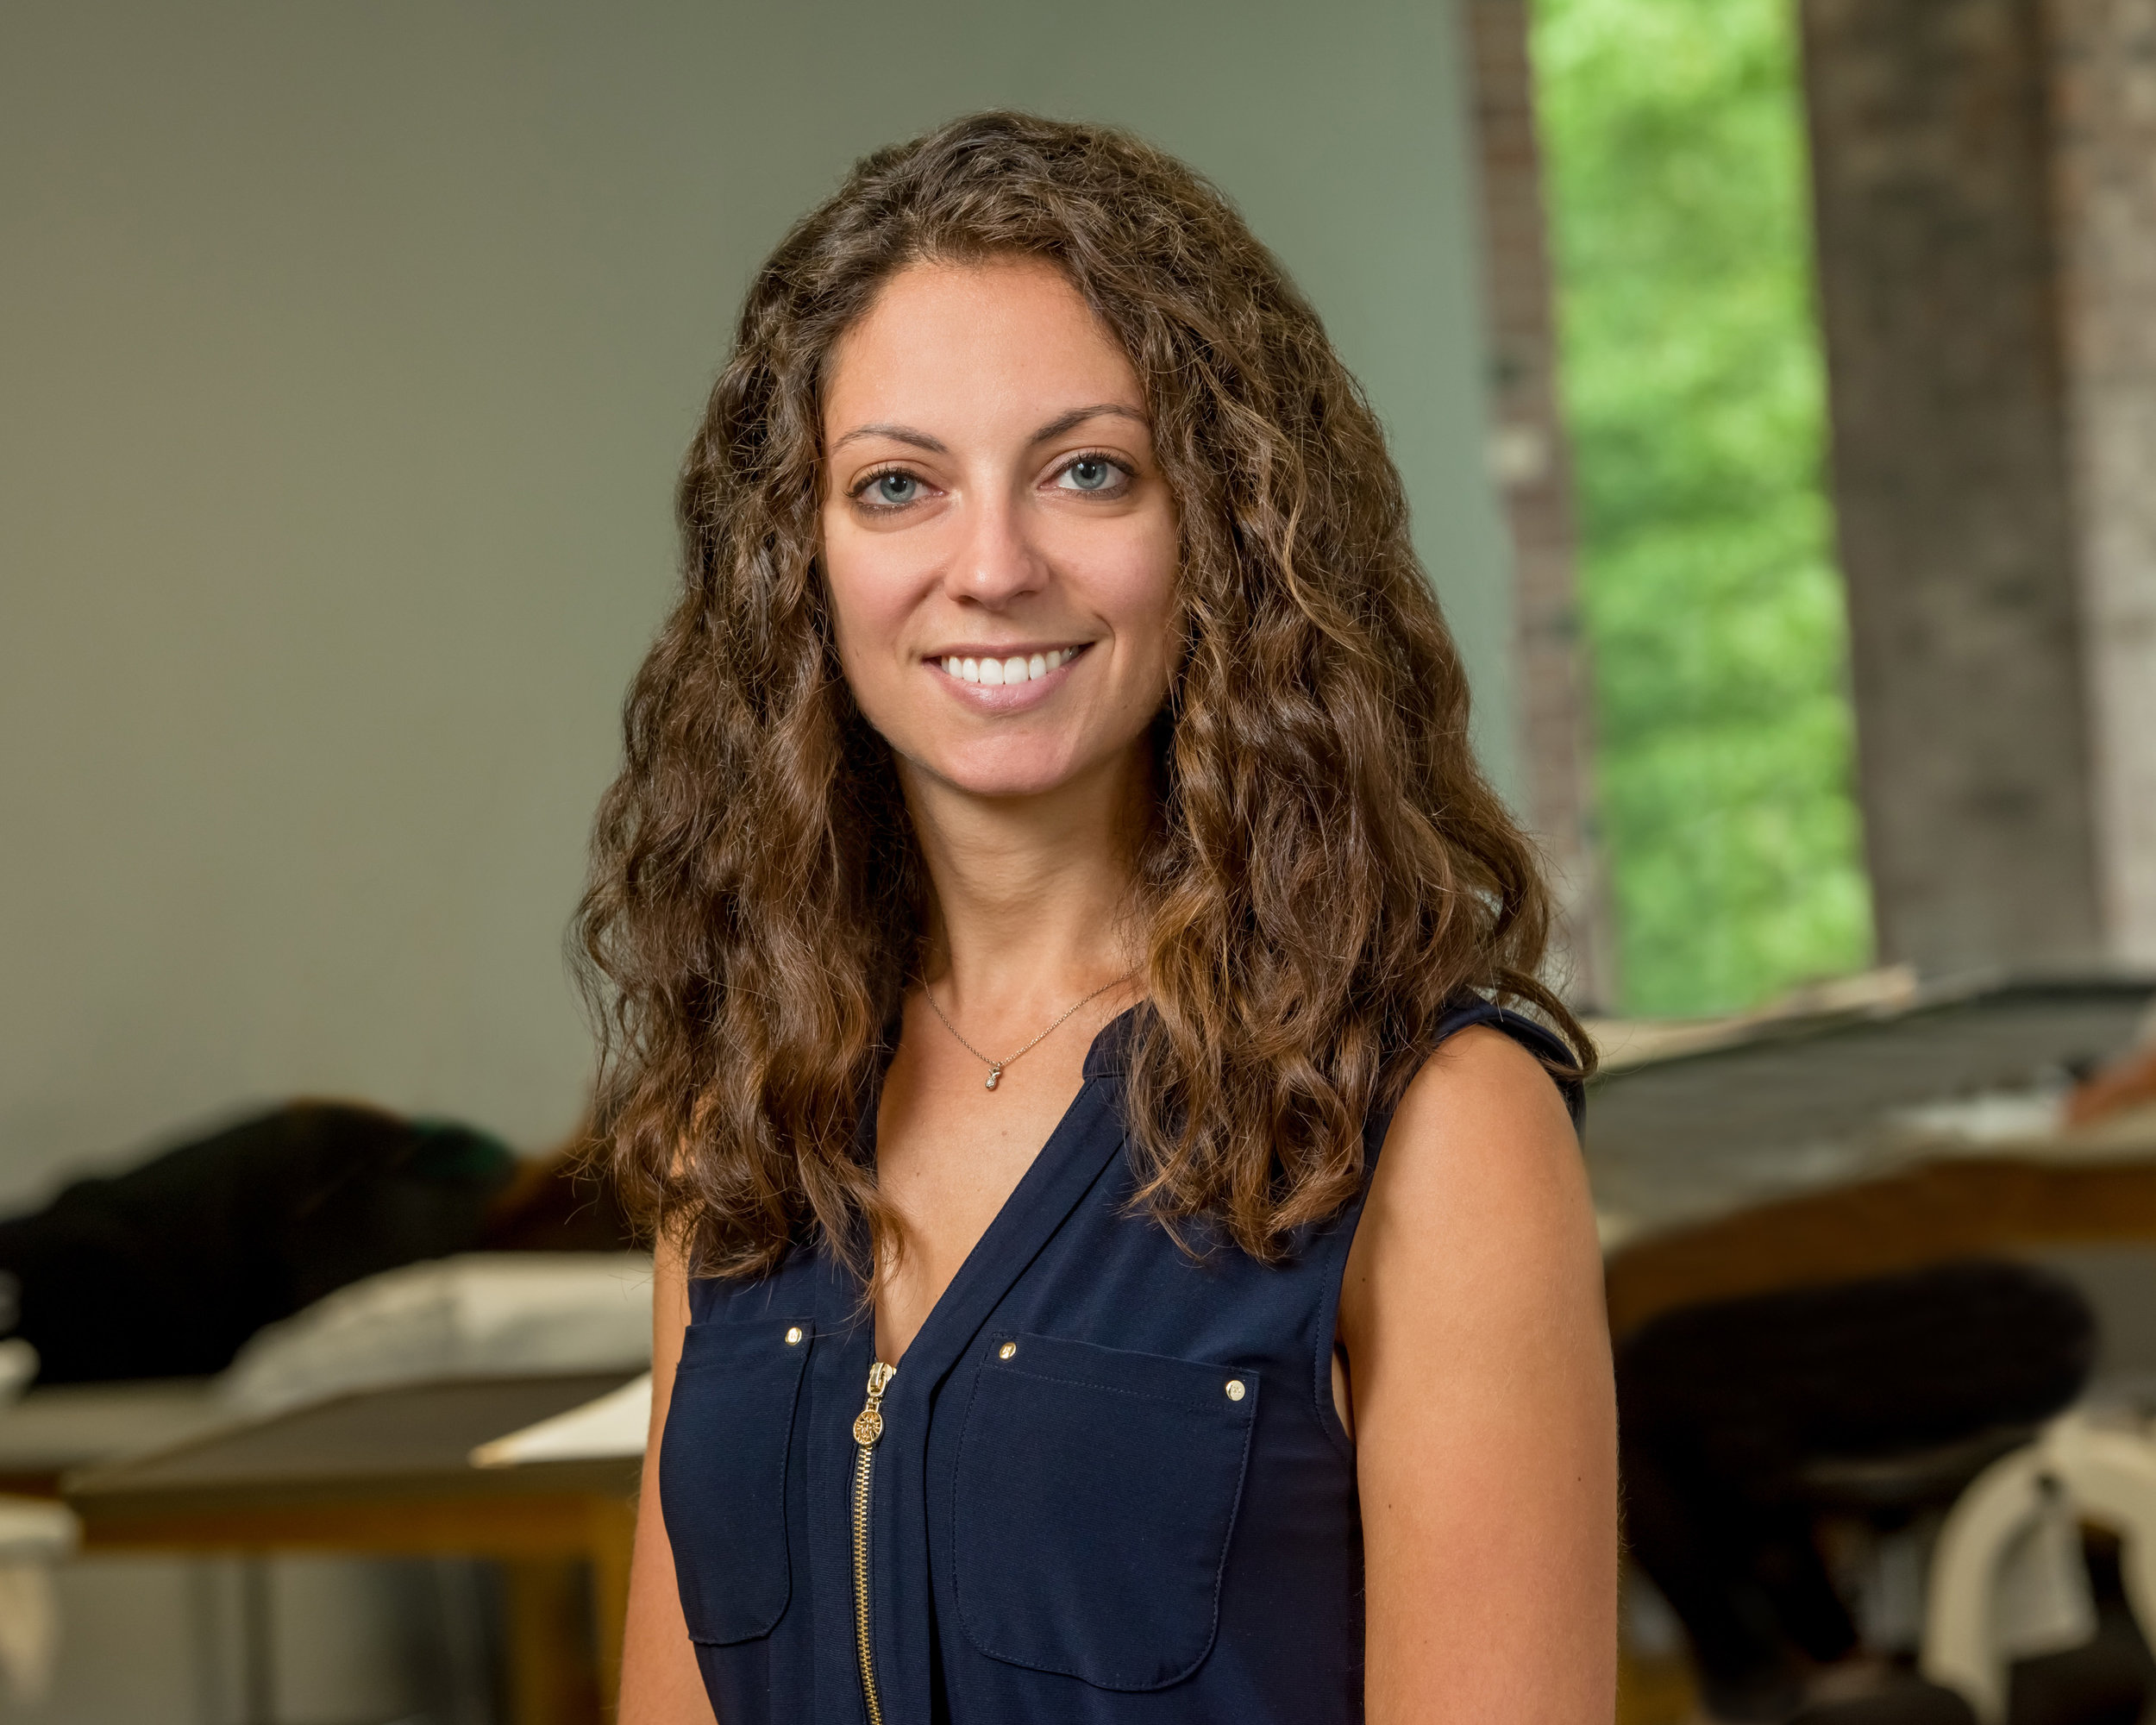 Lattimore Physical Therapist Jena Sapere